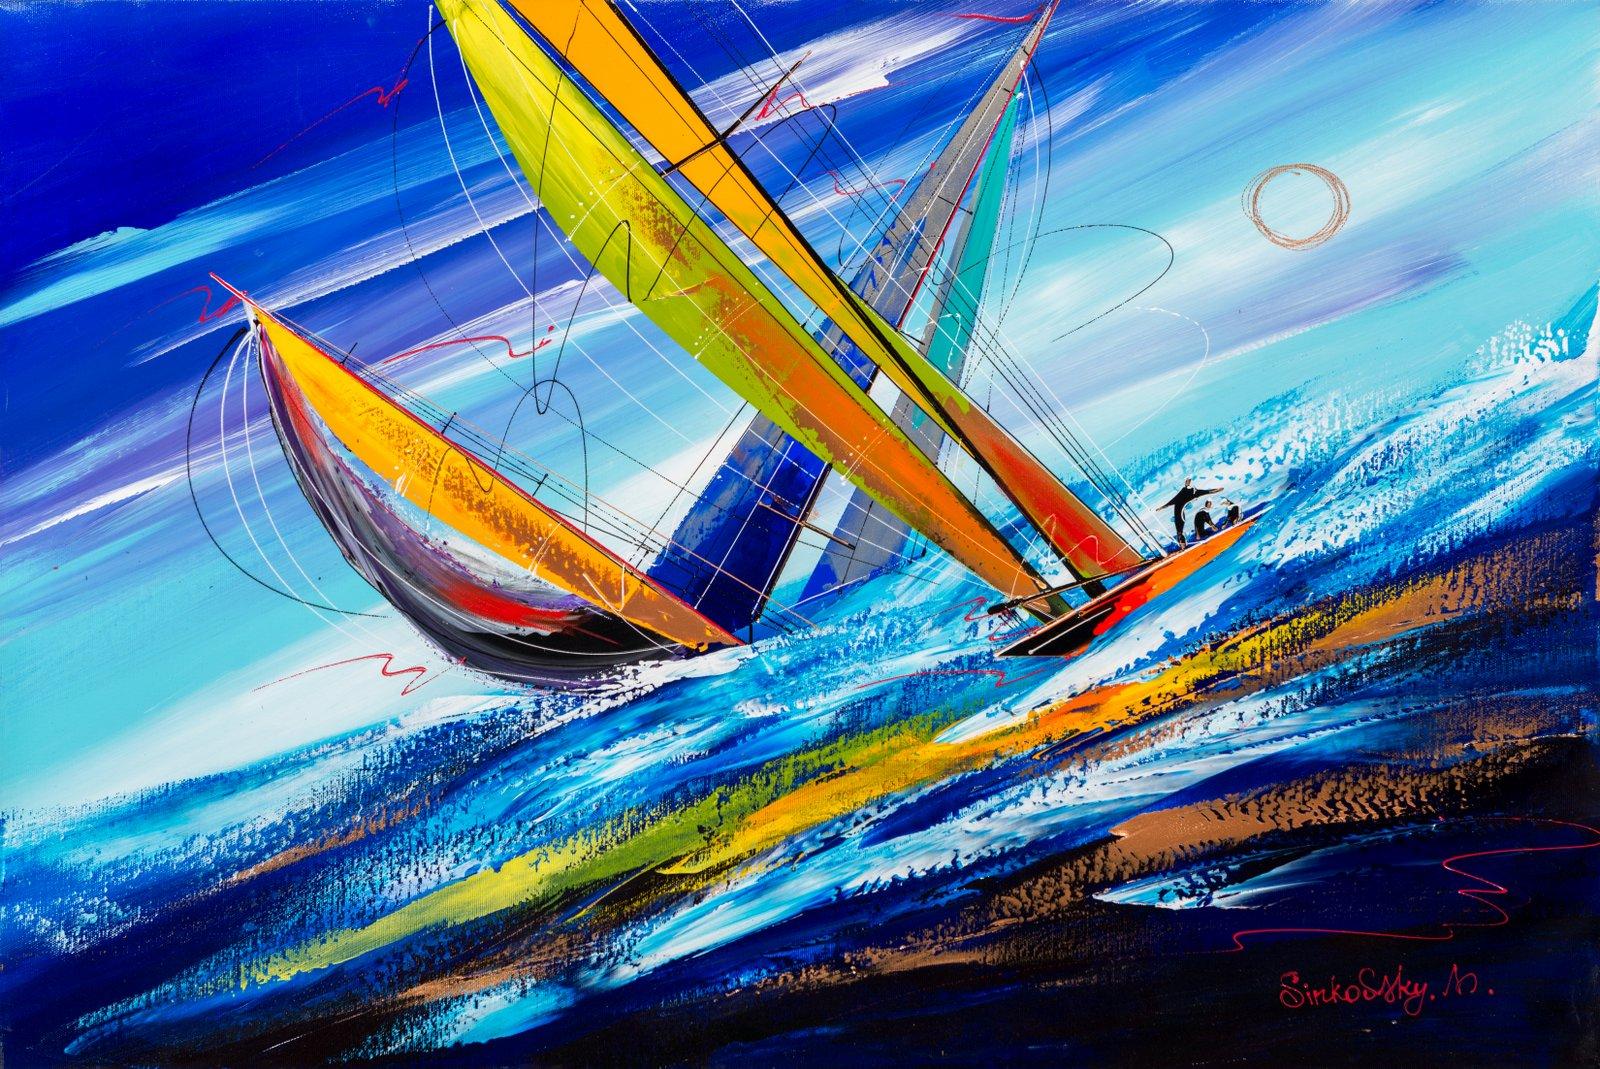 Natalia Sinkovsky's art